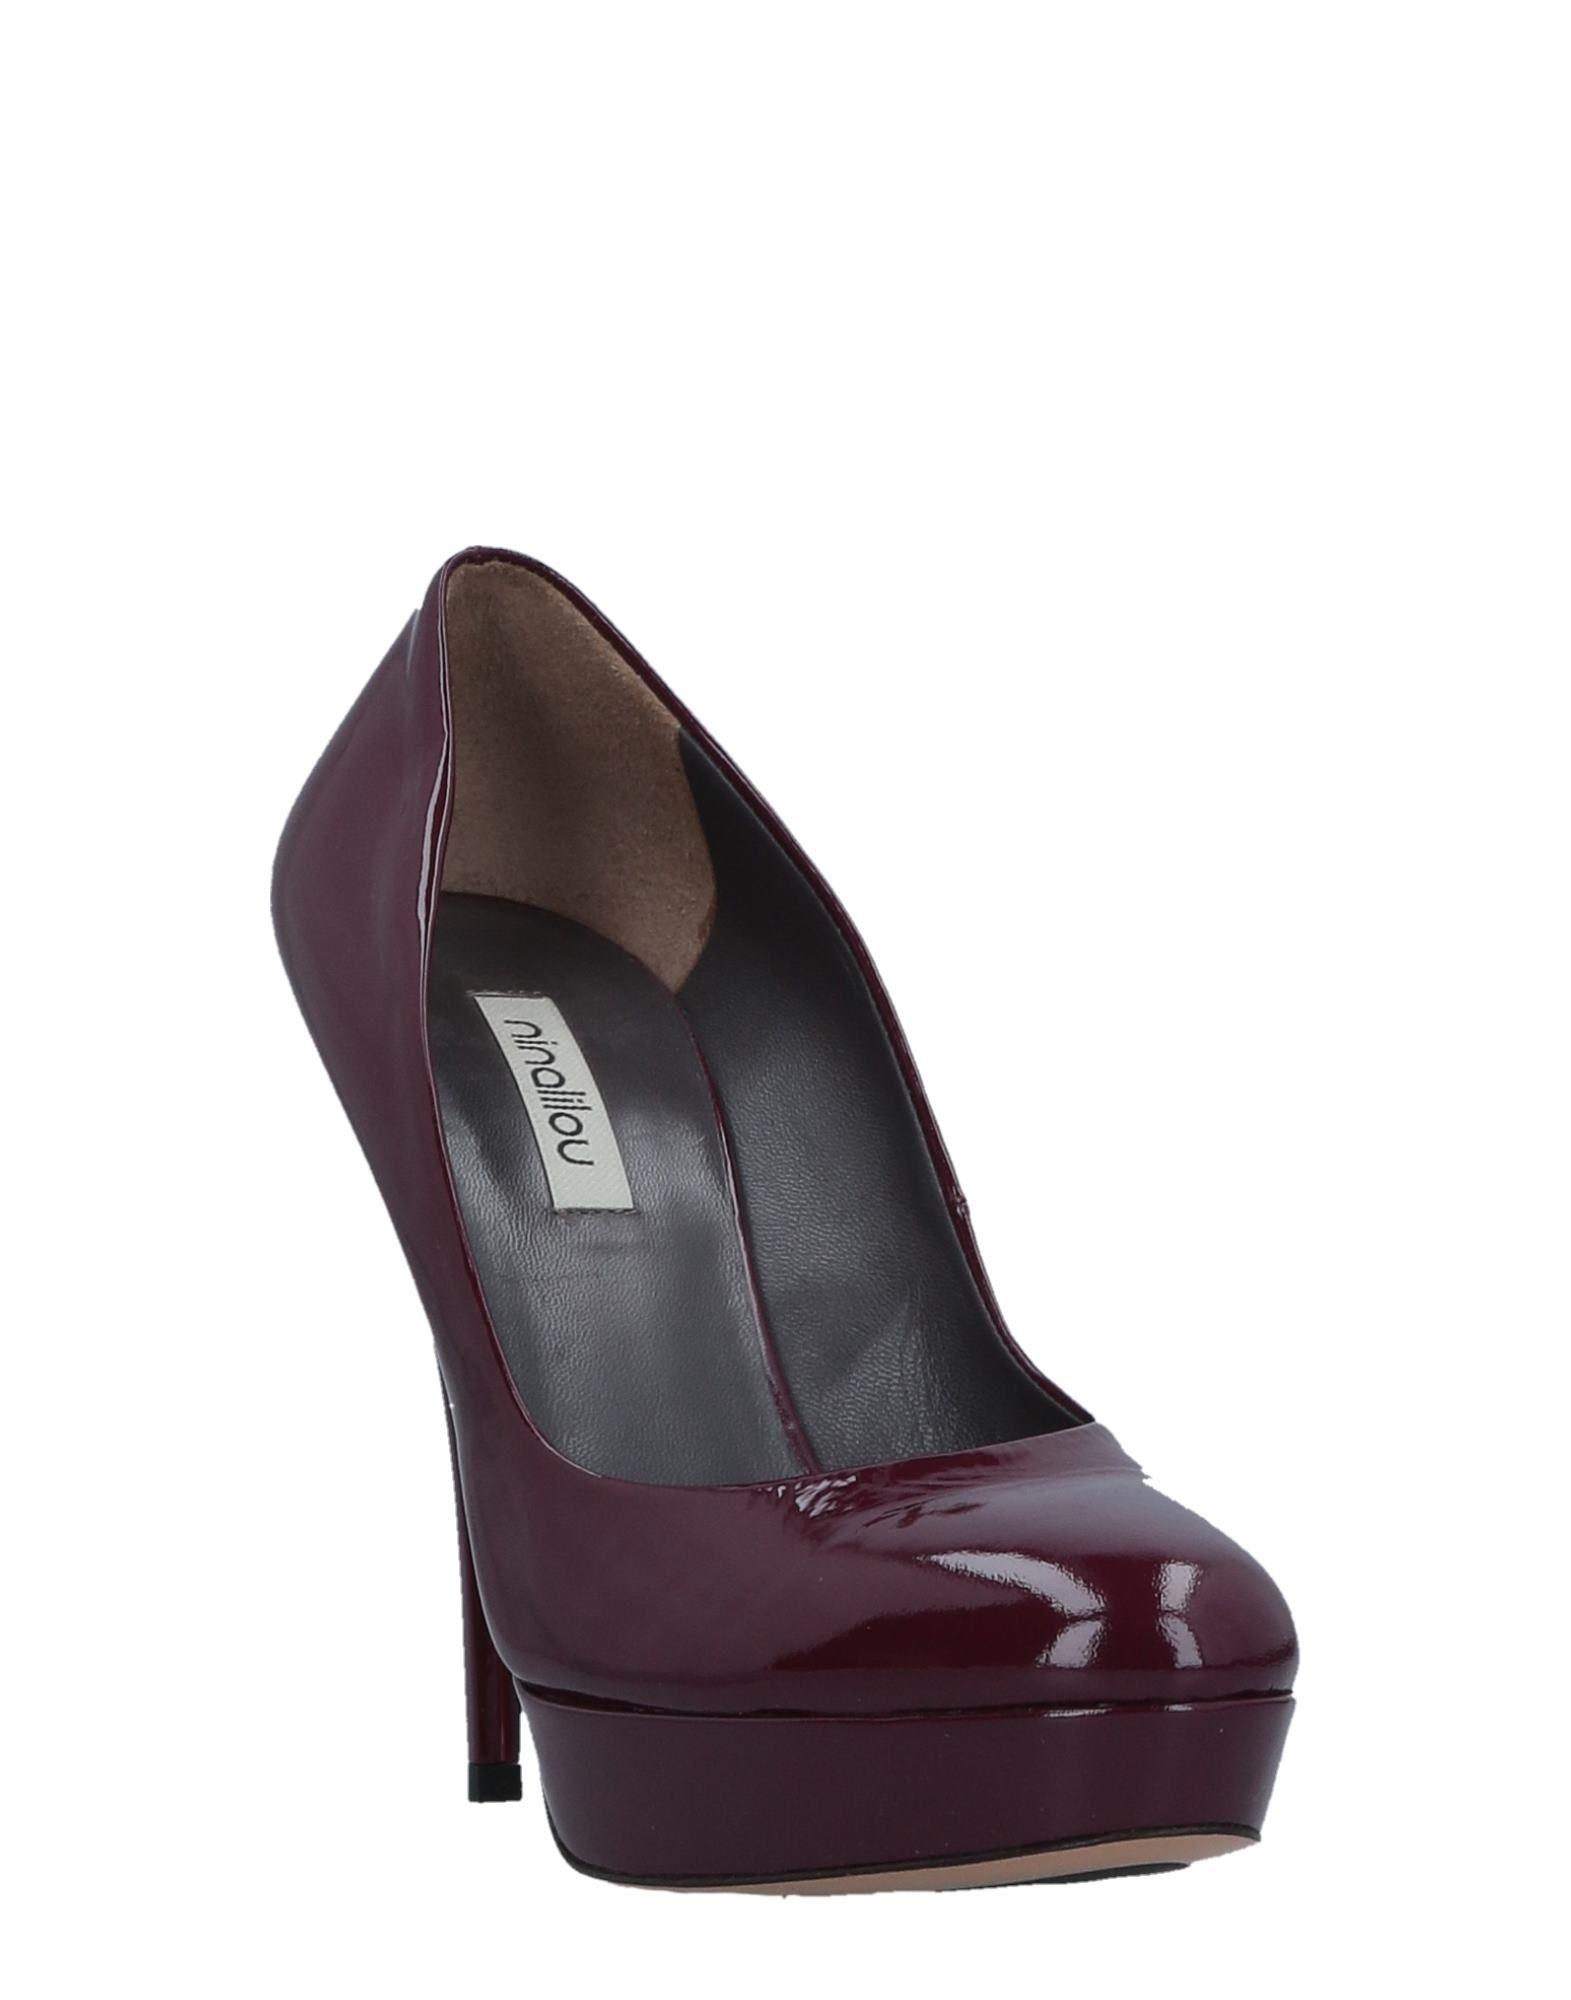 Haltbare  Mode billige Schuhe Ninalilou Pumps Damen  Haltbare 44670904QS Heiße Schuhe 75cd8c